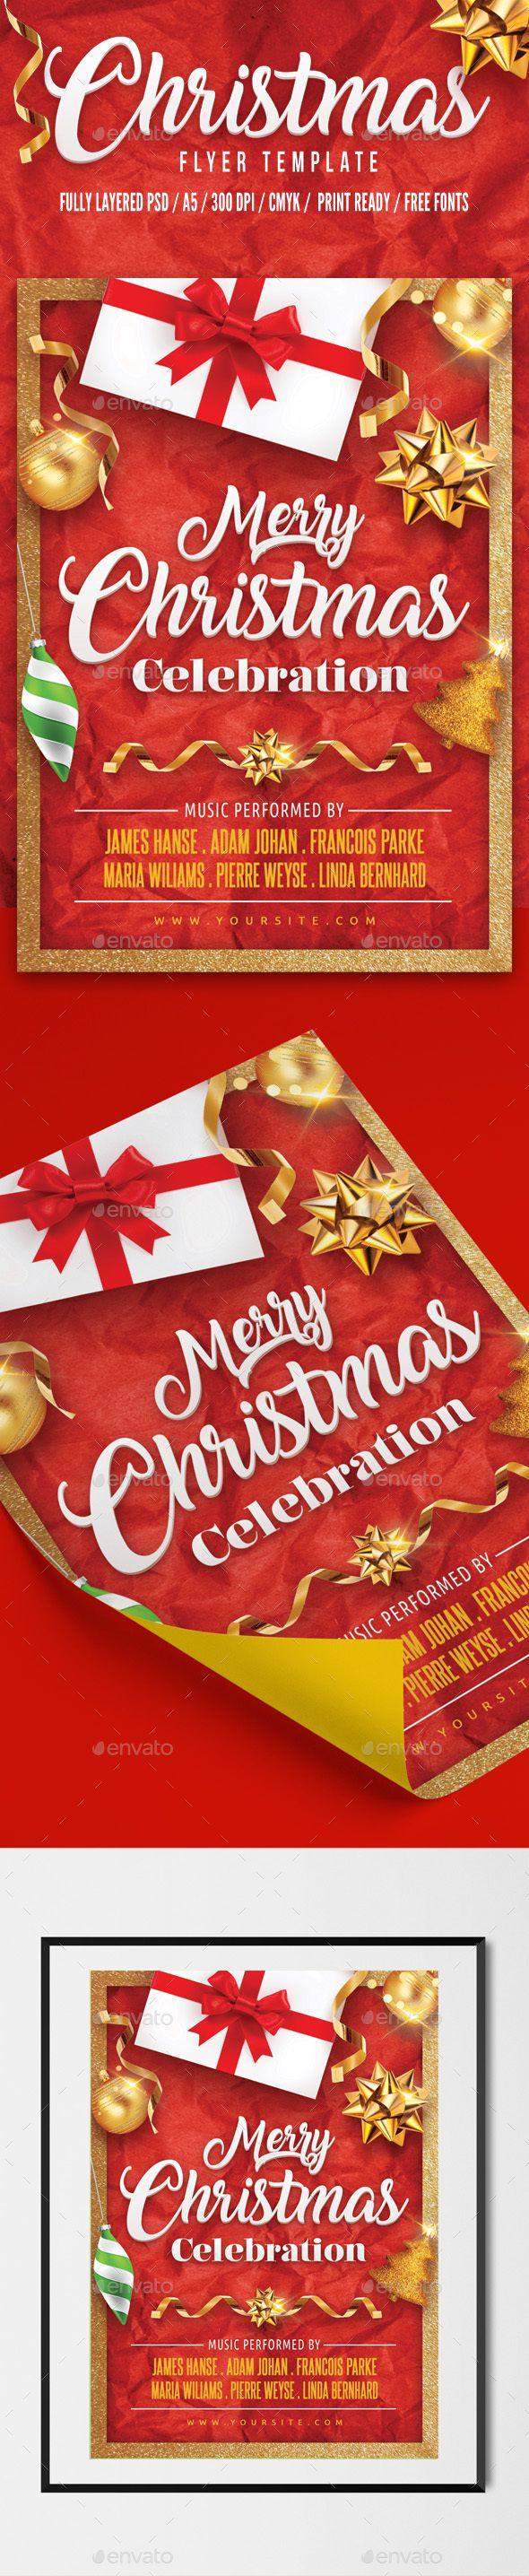 Christmas Flyer Template PSD #xmas #christmaseve #partyflyer